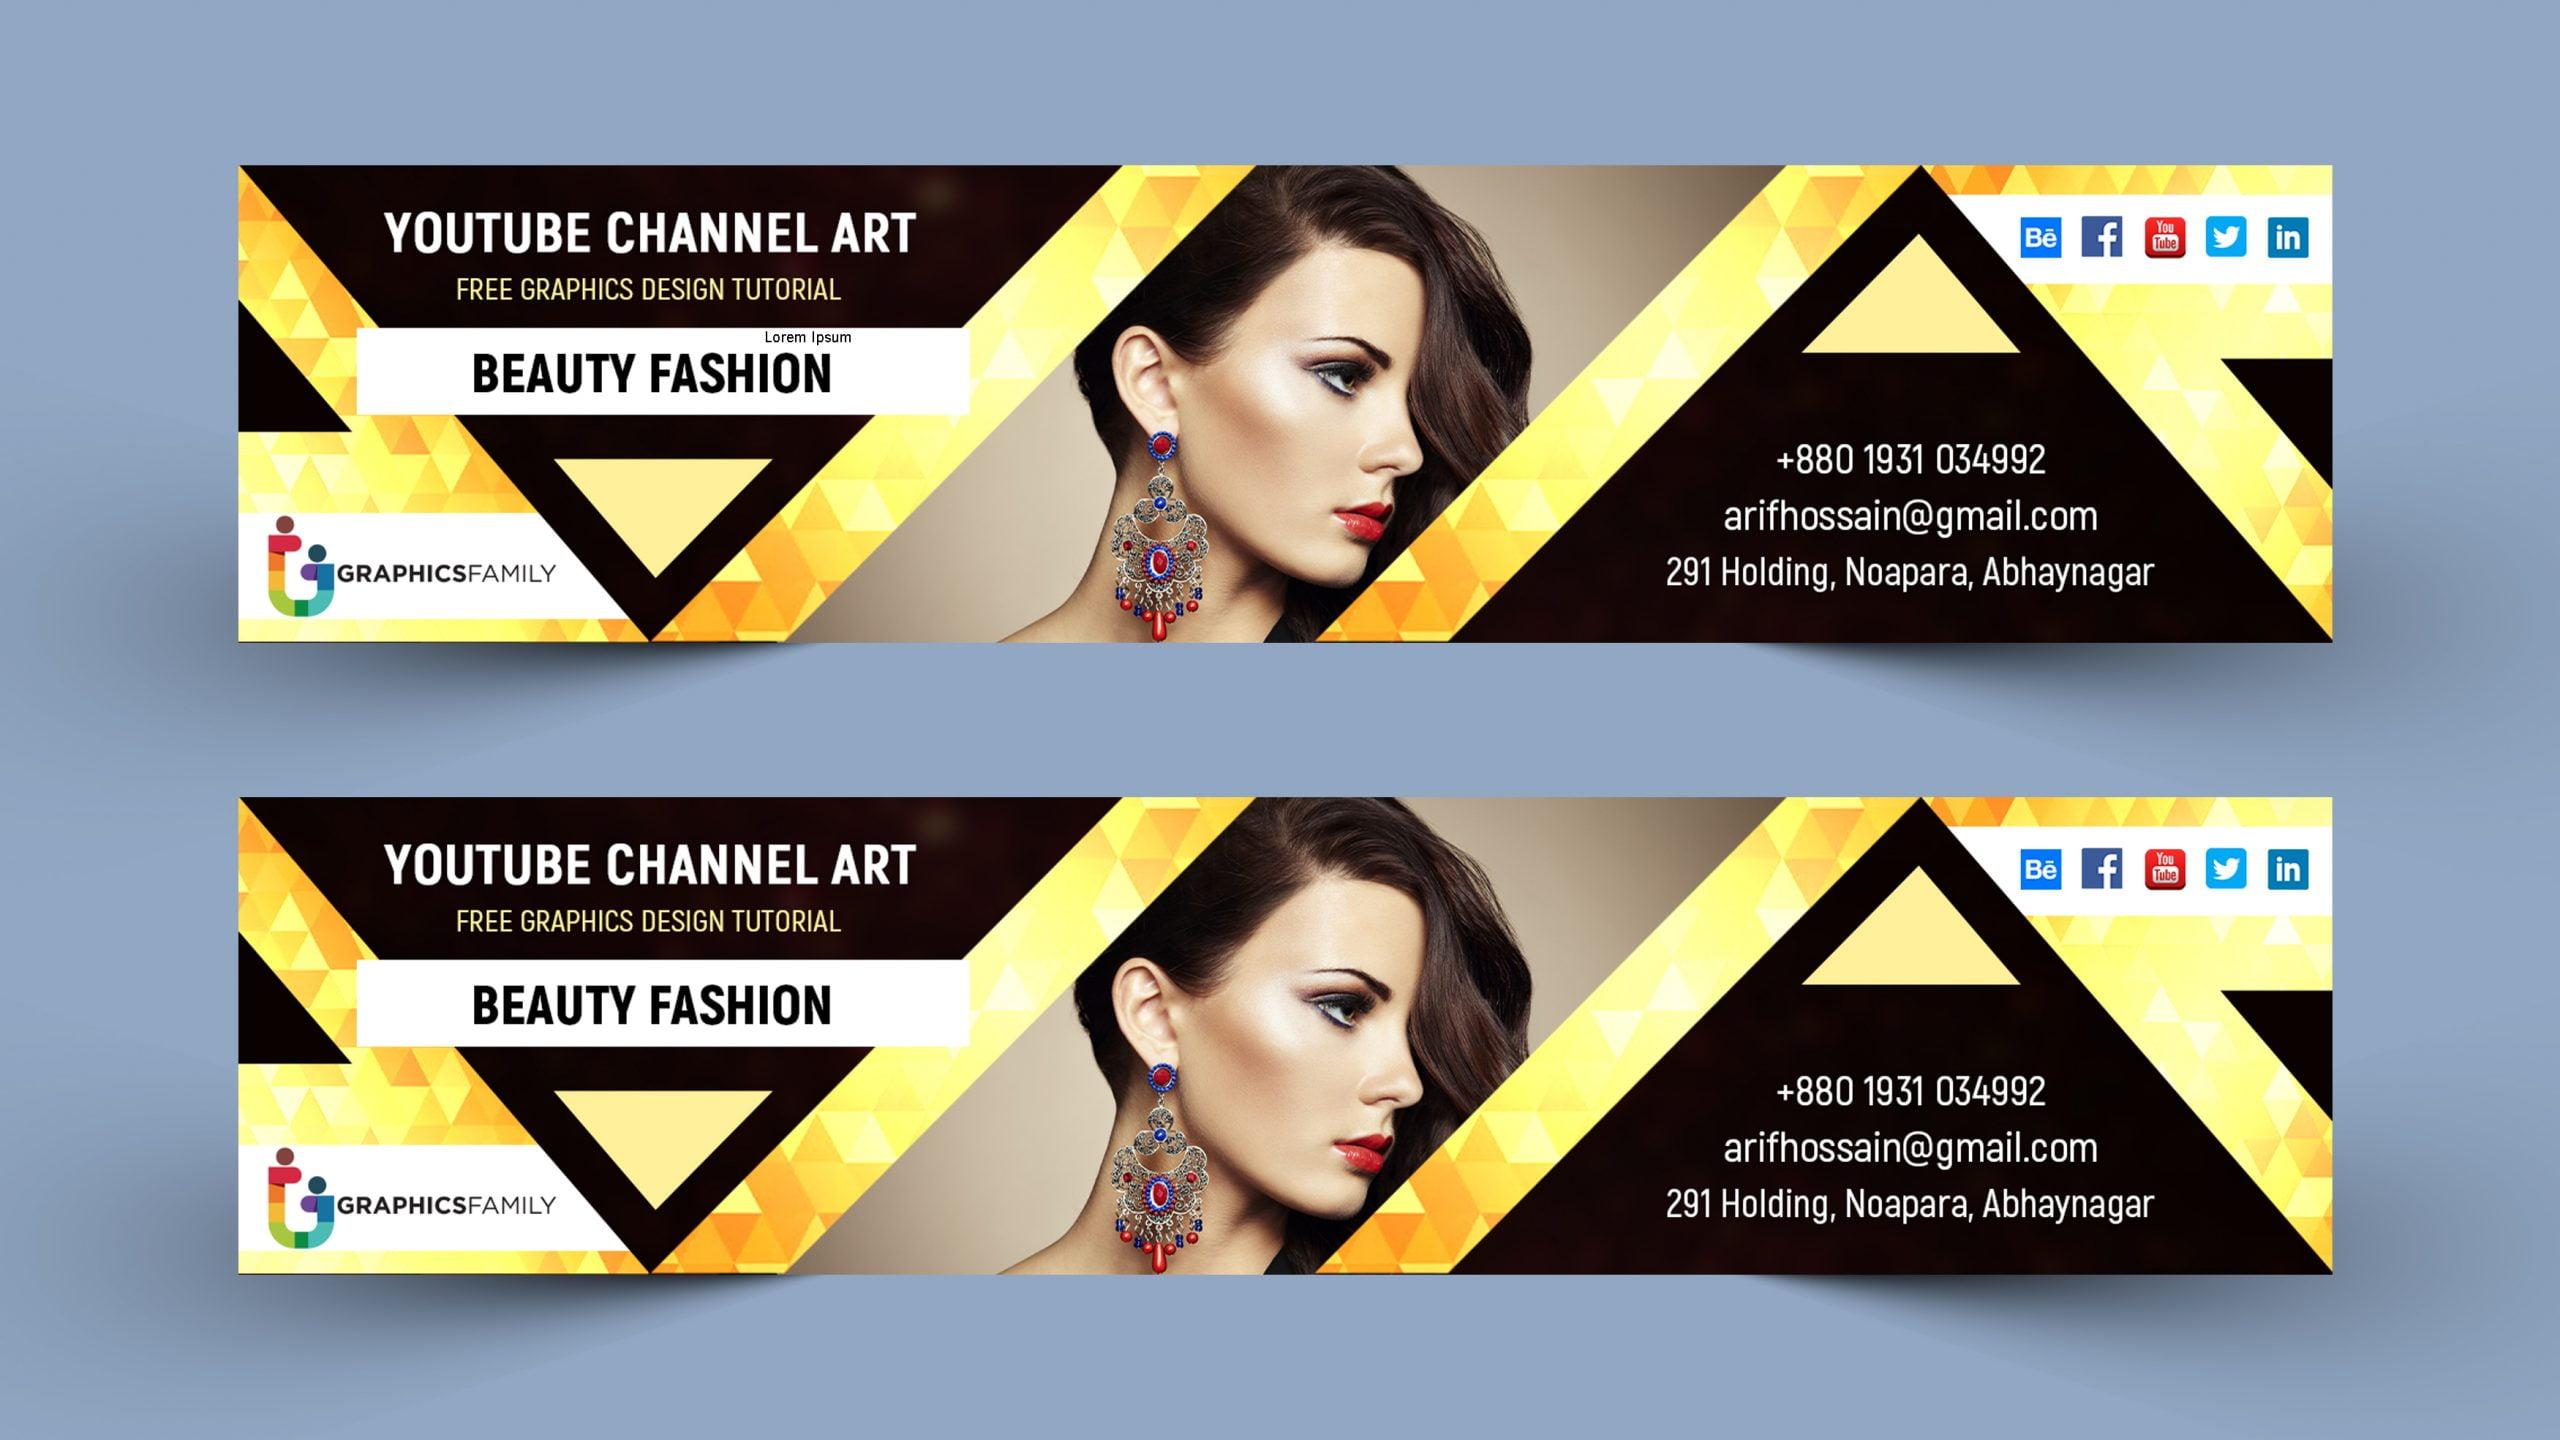 Luxury Youtube Channel Art Banner Design